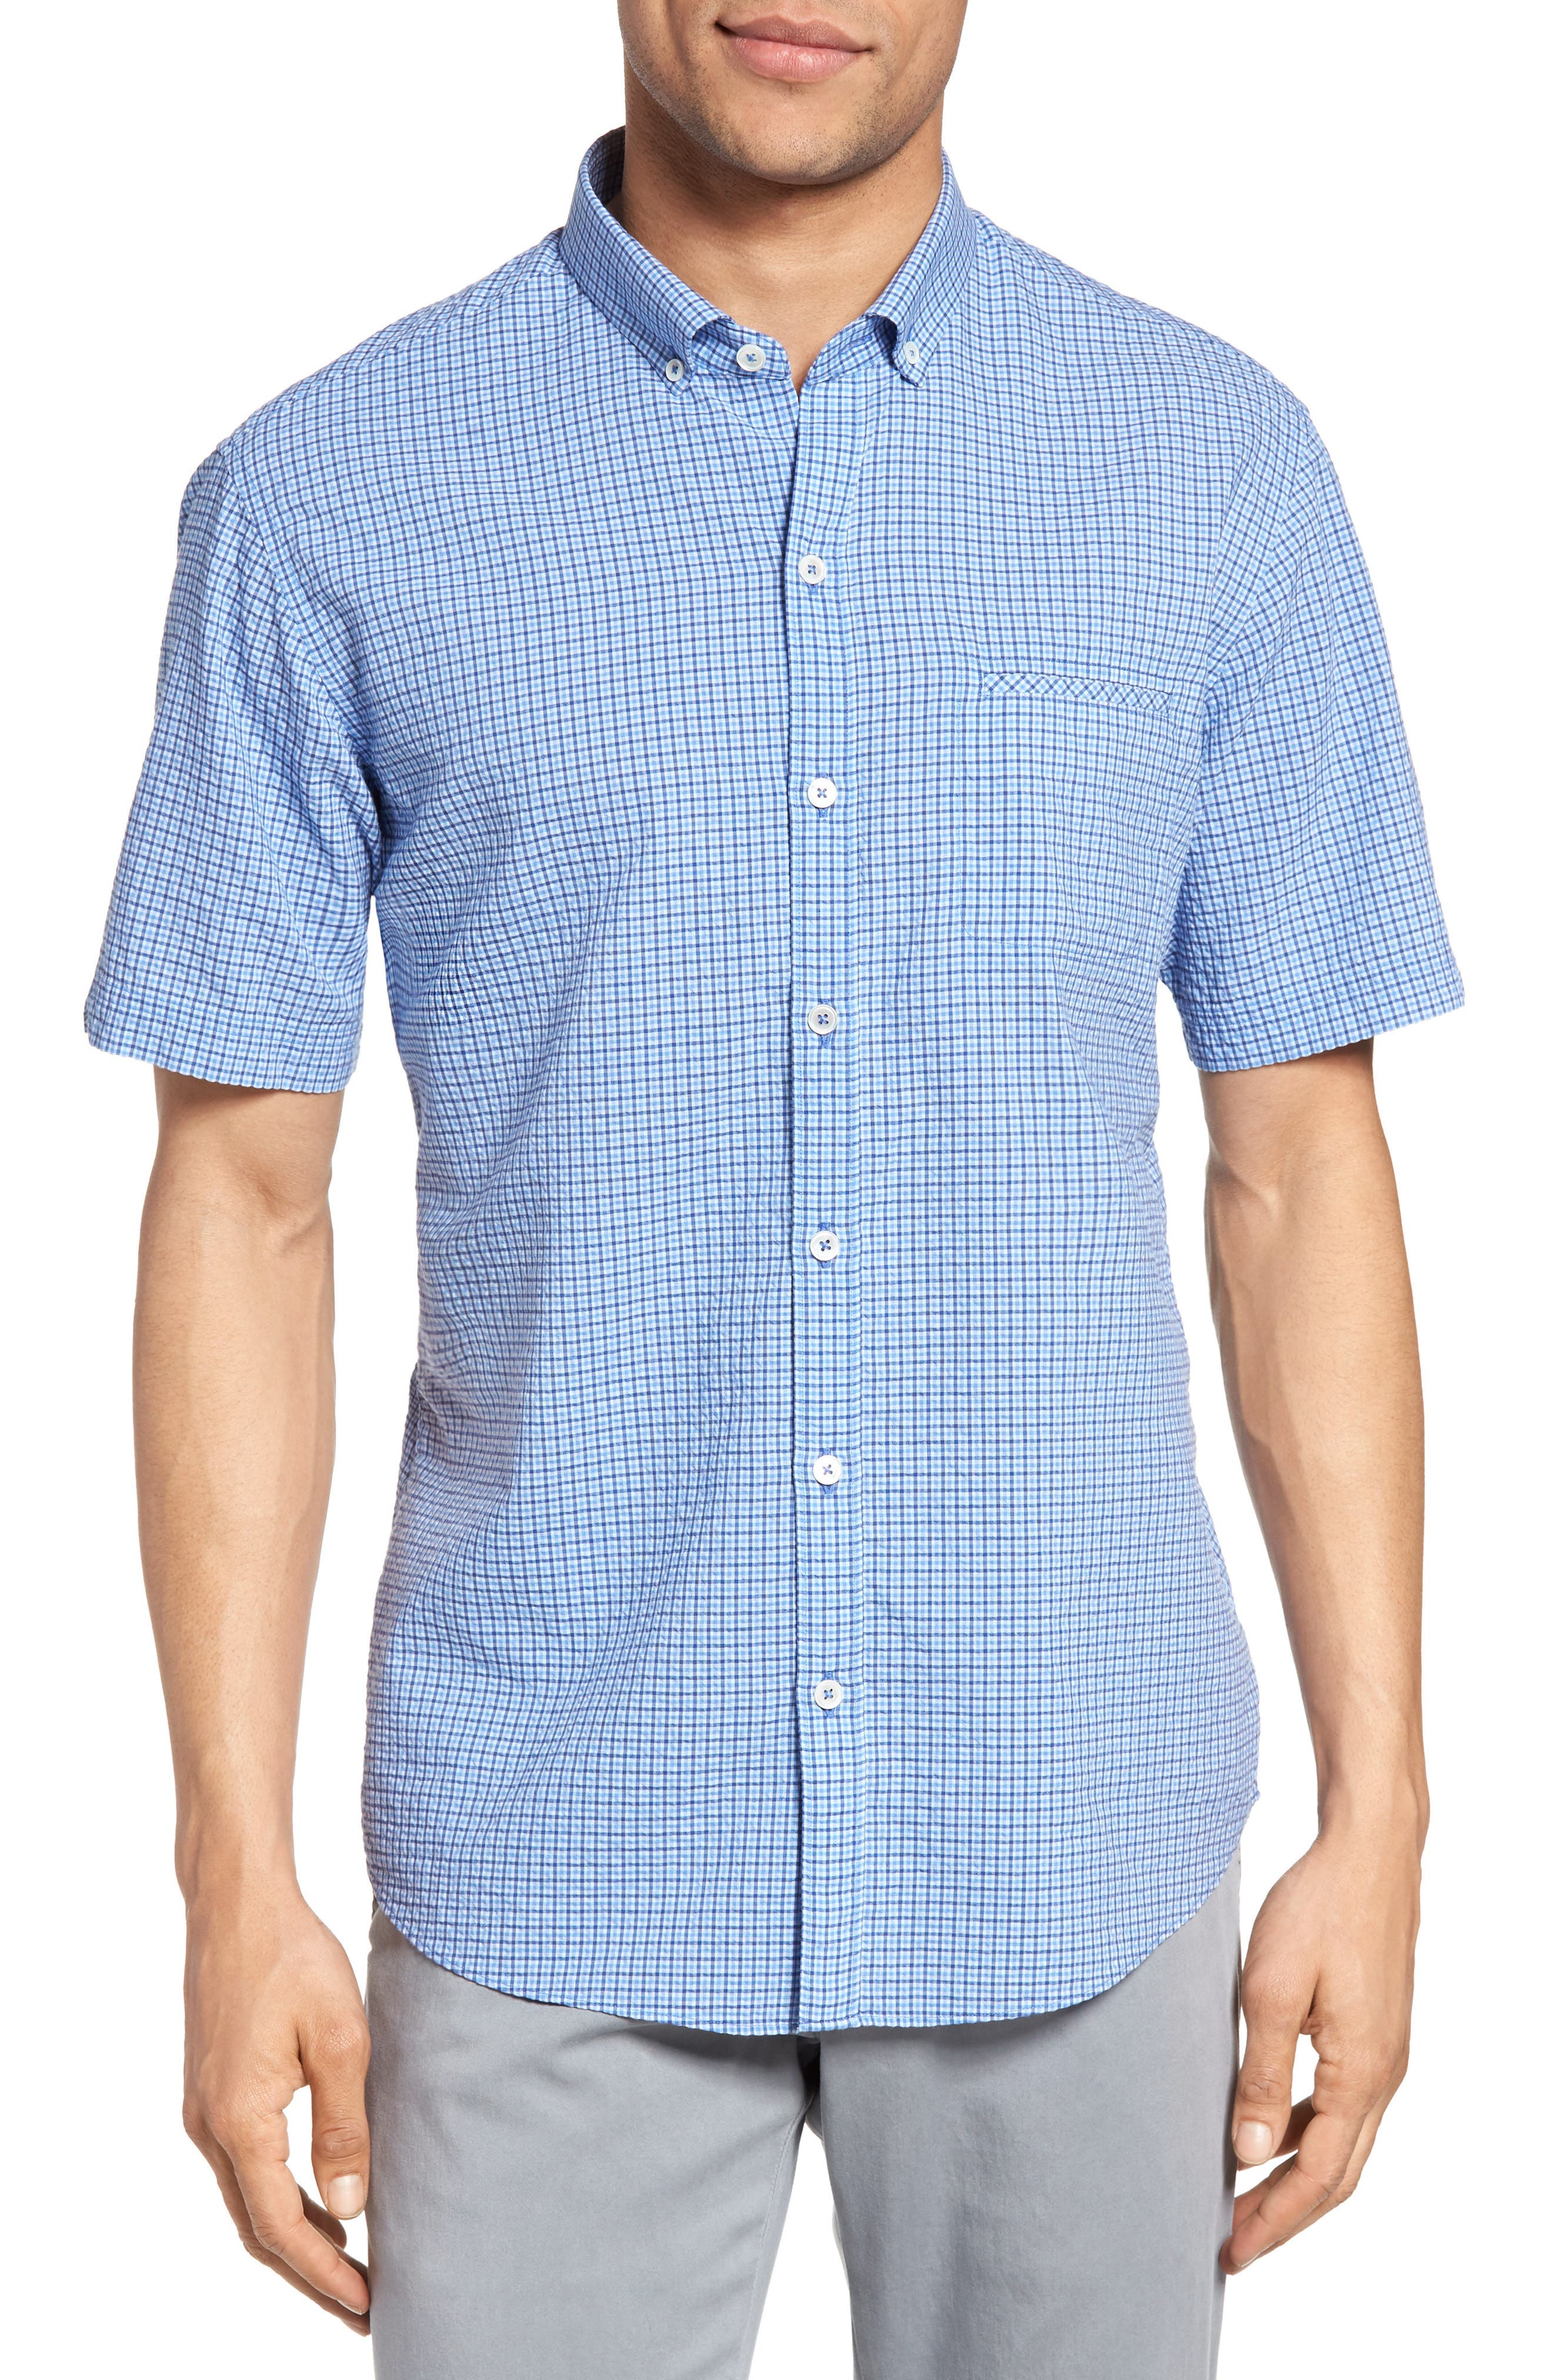 Billy Trim Fit Plaid Sport Shirt,                         Main,                         color, 422